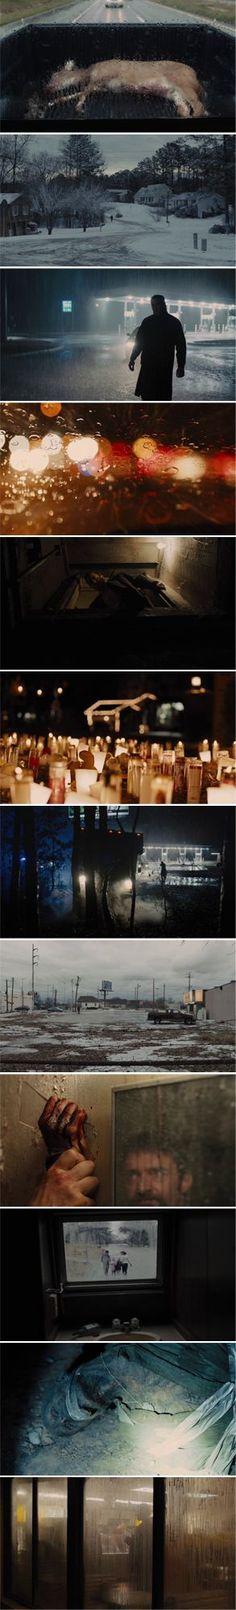 #rogerdeakins #cinematography #prisoners